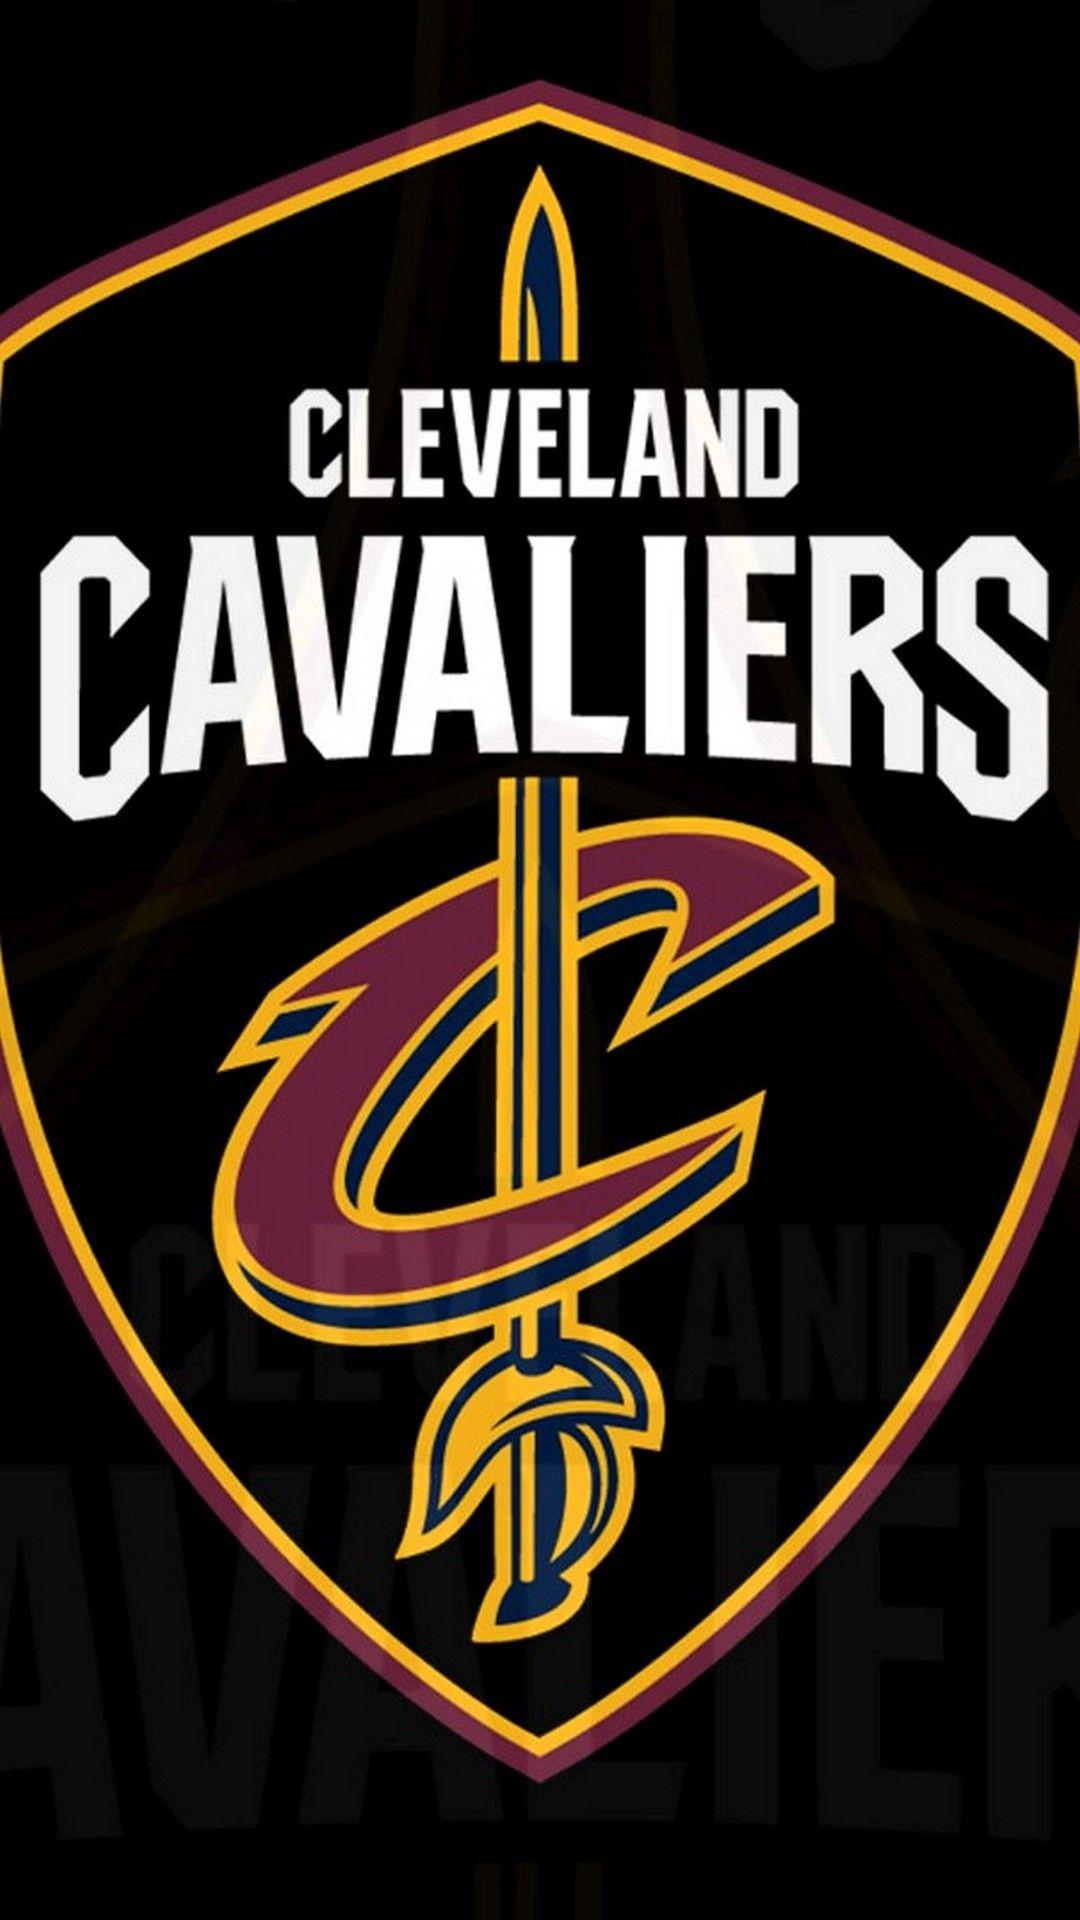 Cavs Iphone 7 Plus Wallpaper 2021 Basketball Wallpaper Nba Logo Cleveland Cavaliers Logo Sports